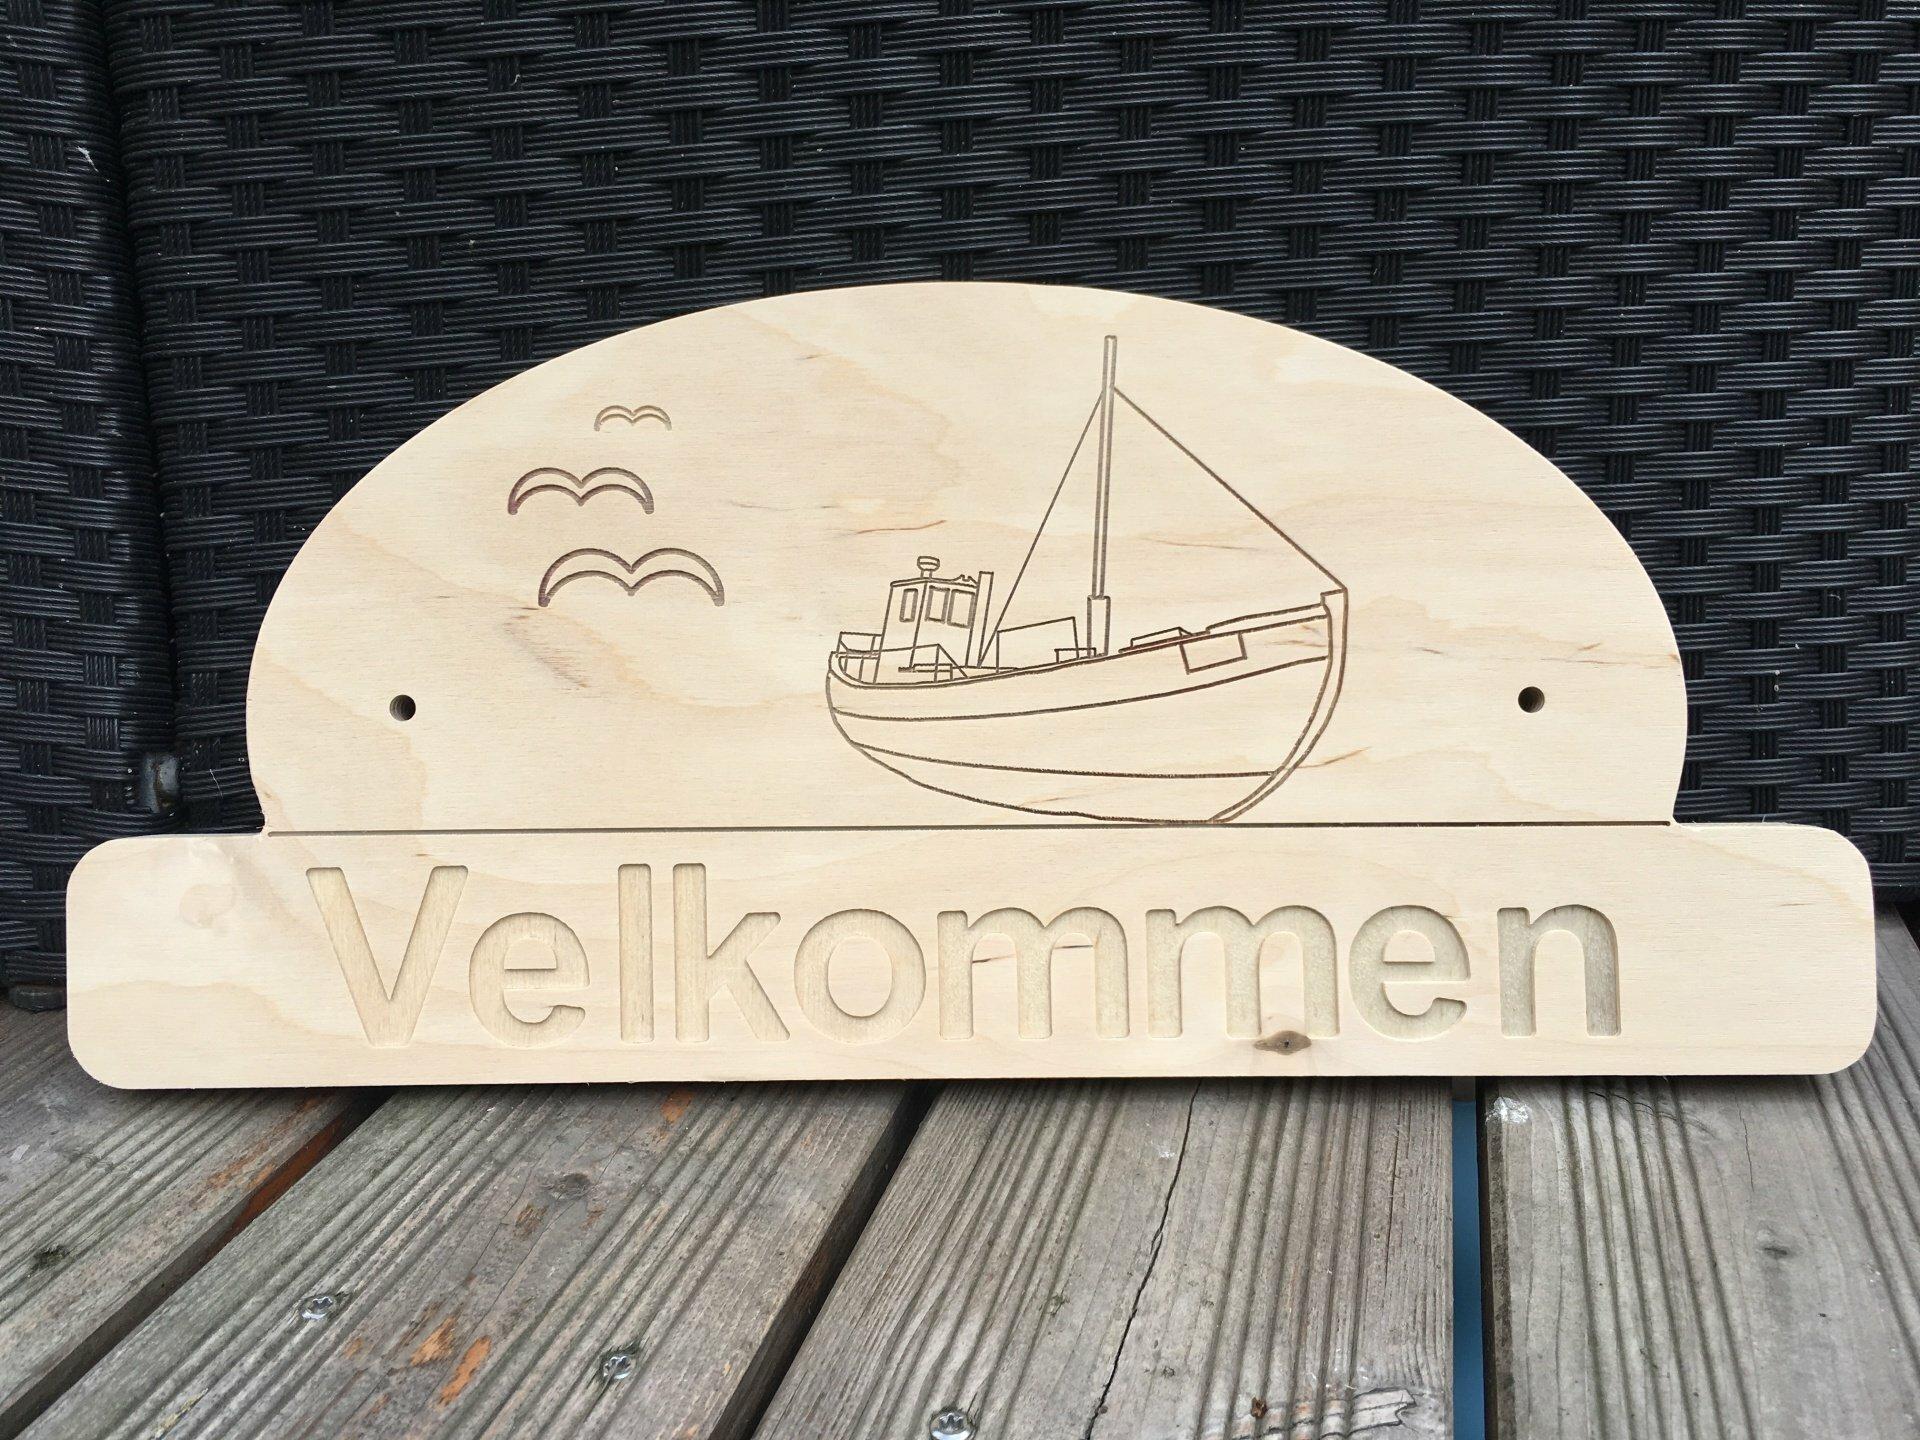 Velkommen Schild Fischerboot